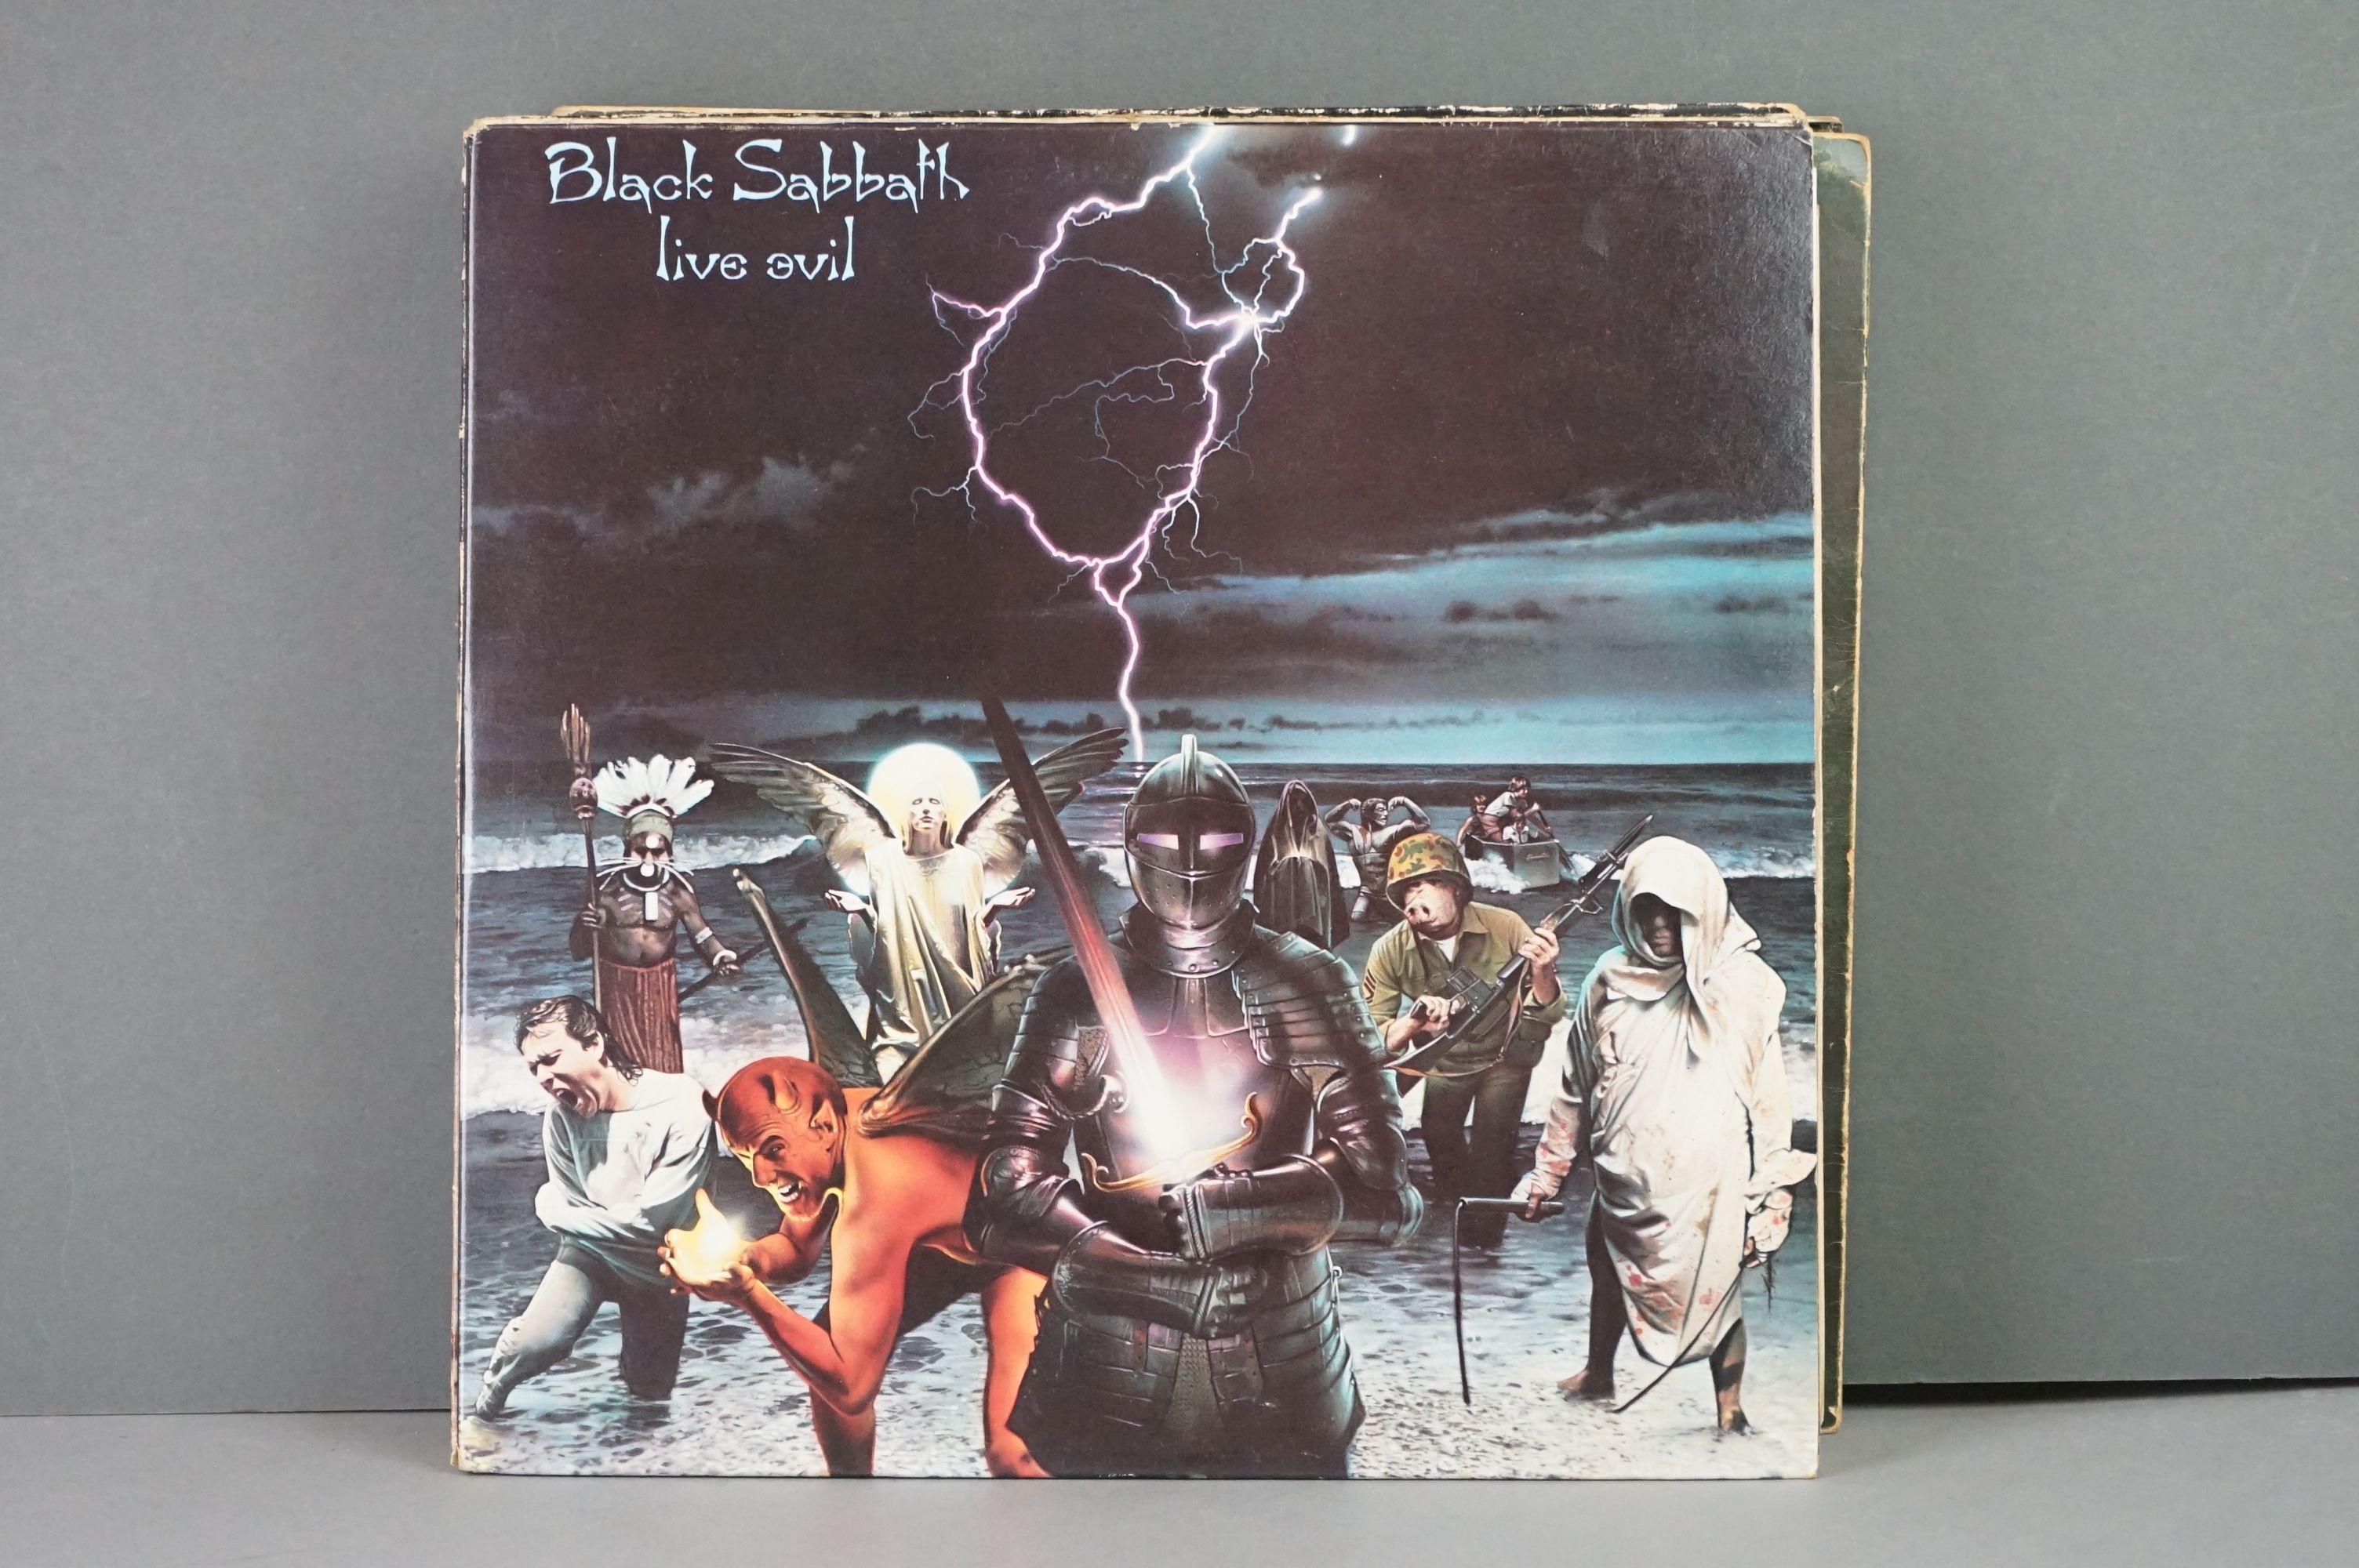 Vinyl - Twelve Black Sabbath vinyl LP's to include Technical Ecstasy (Vertigo Records PRICE 40), - Image 3 of 17